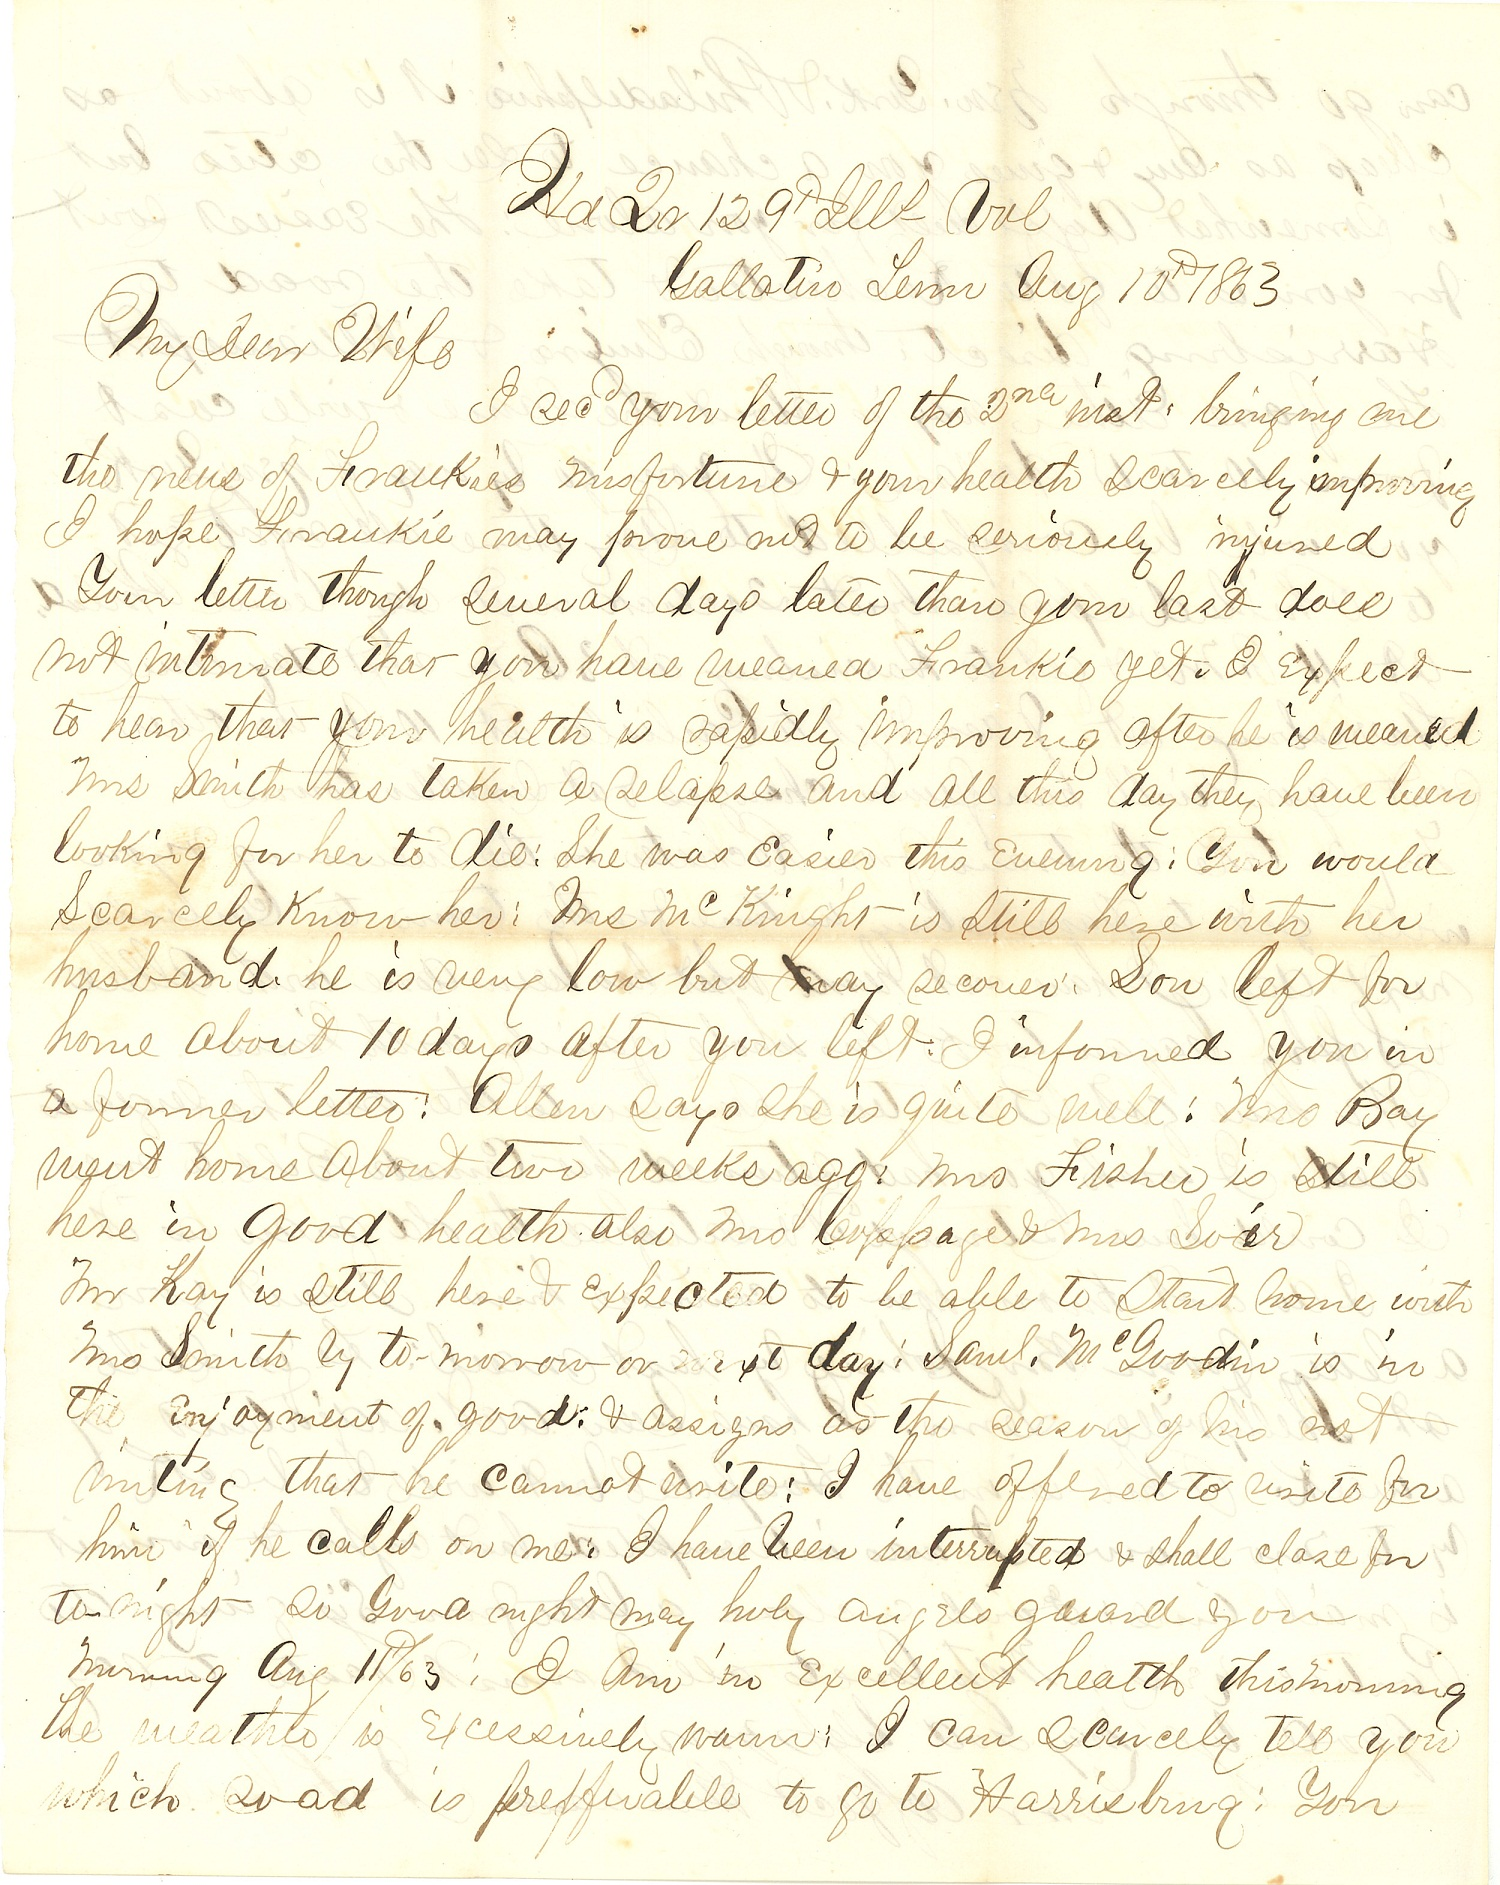 Joseph Culver Letter, August 10, 1863, Page 1